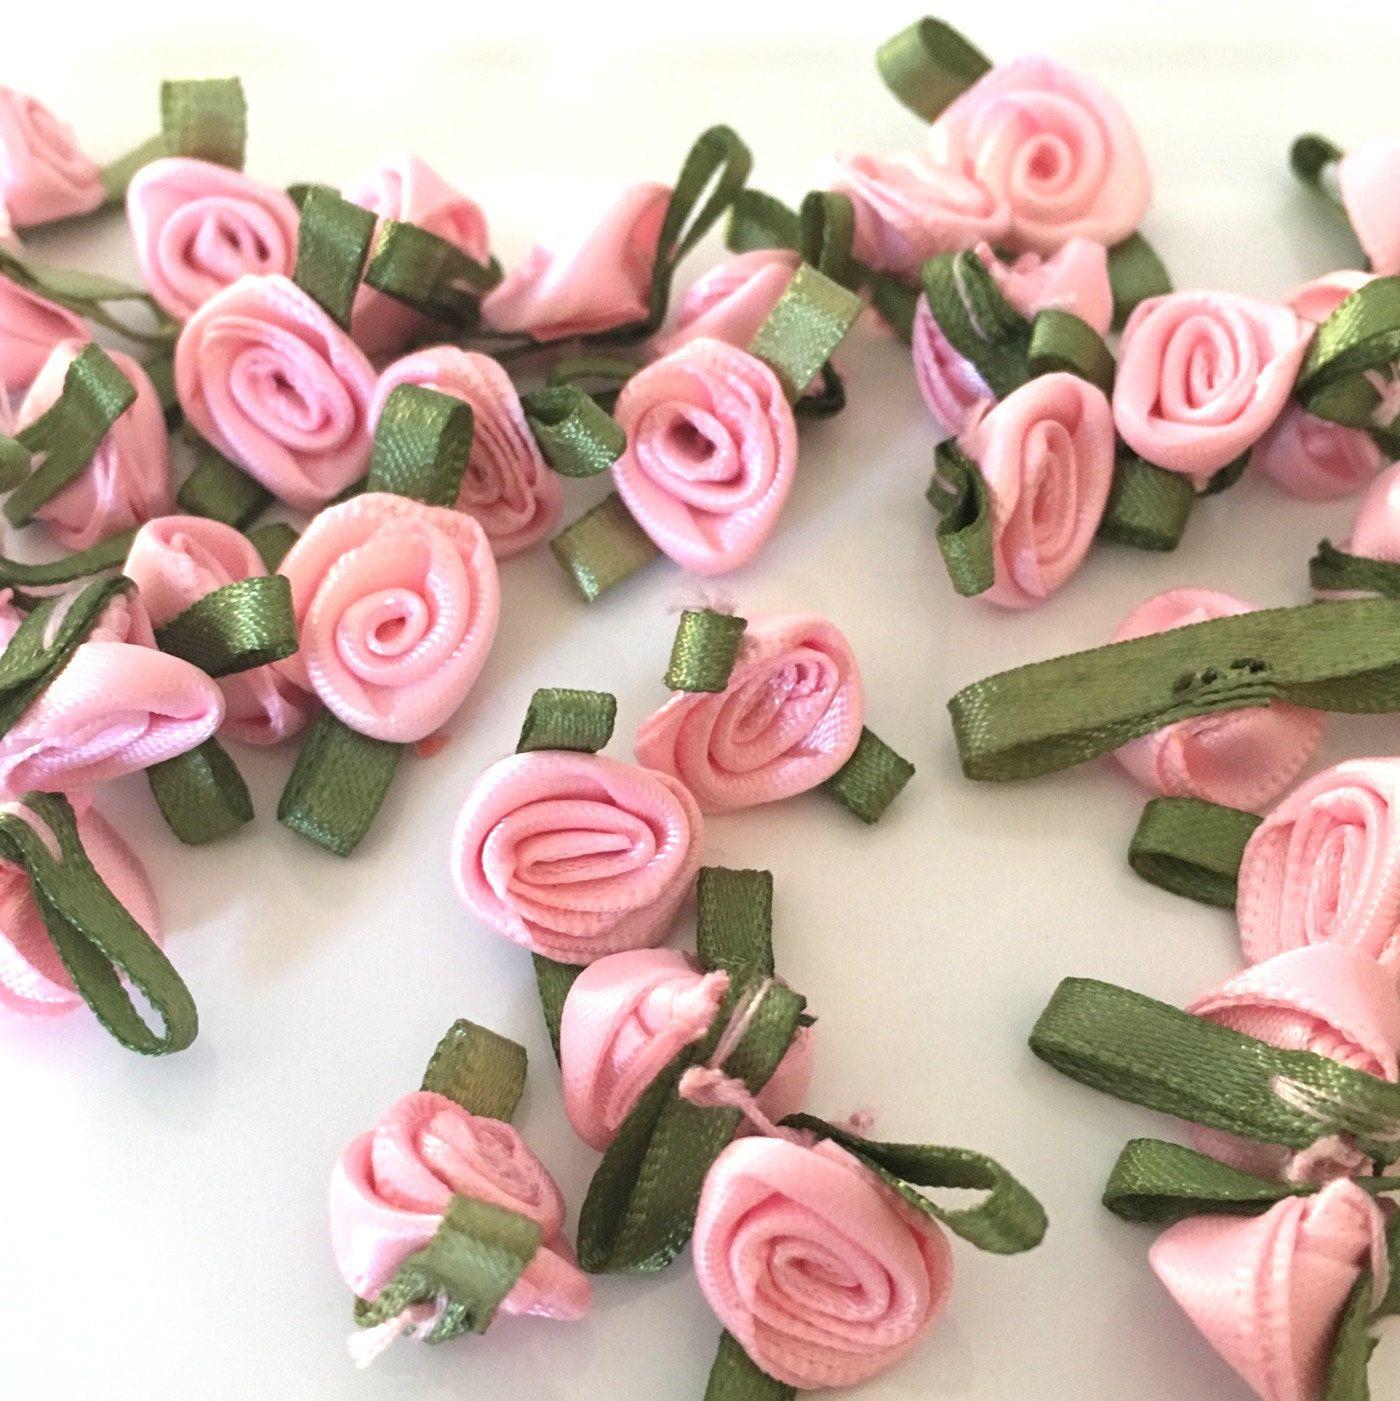 20 Pink Ribbon Roses Satin Ribbon Roses Pink Satin Roses Sew On